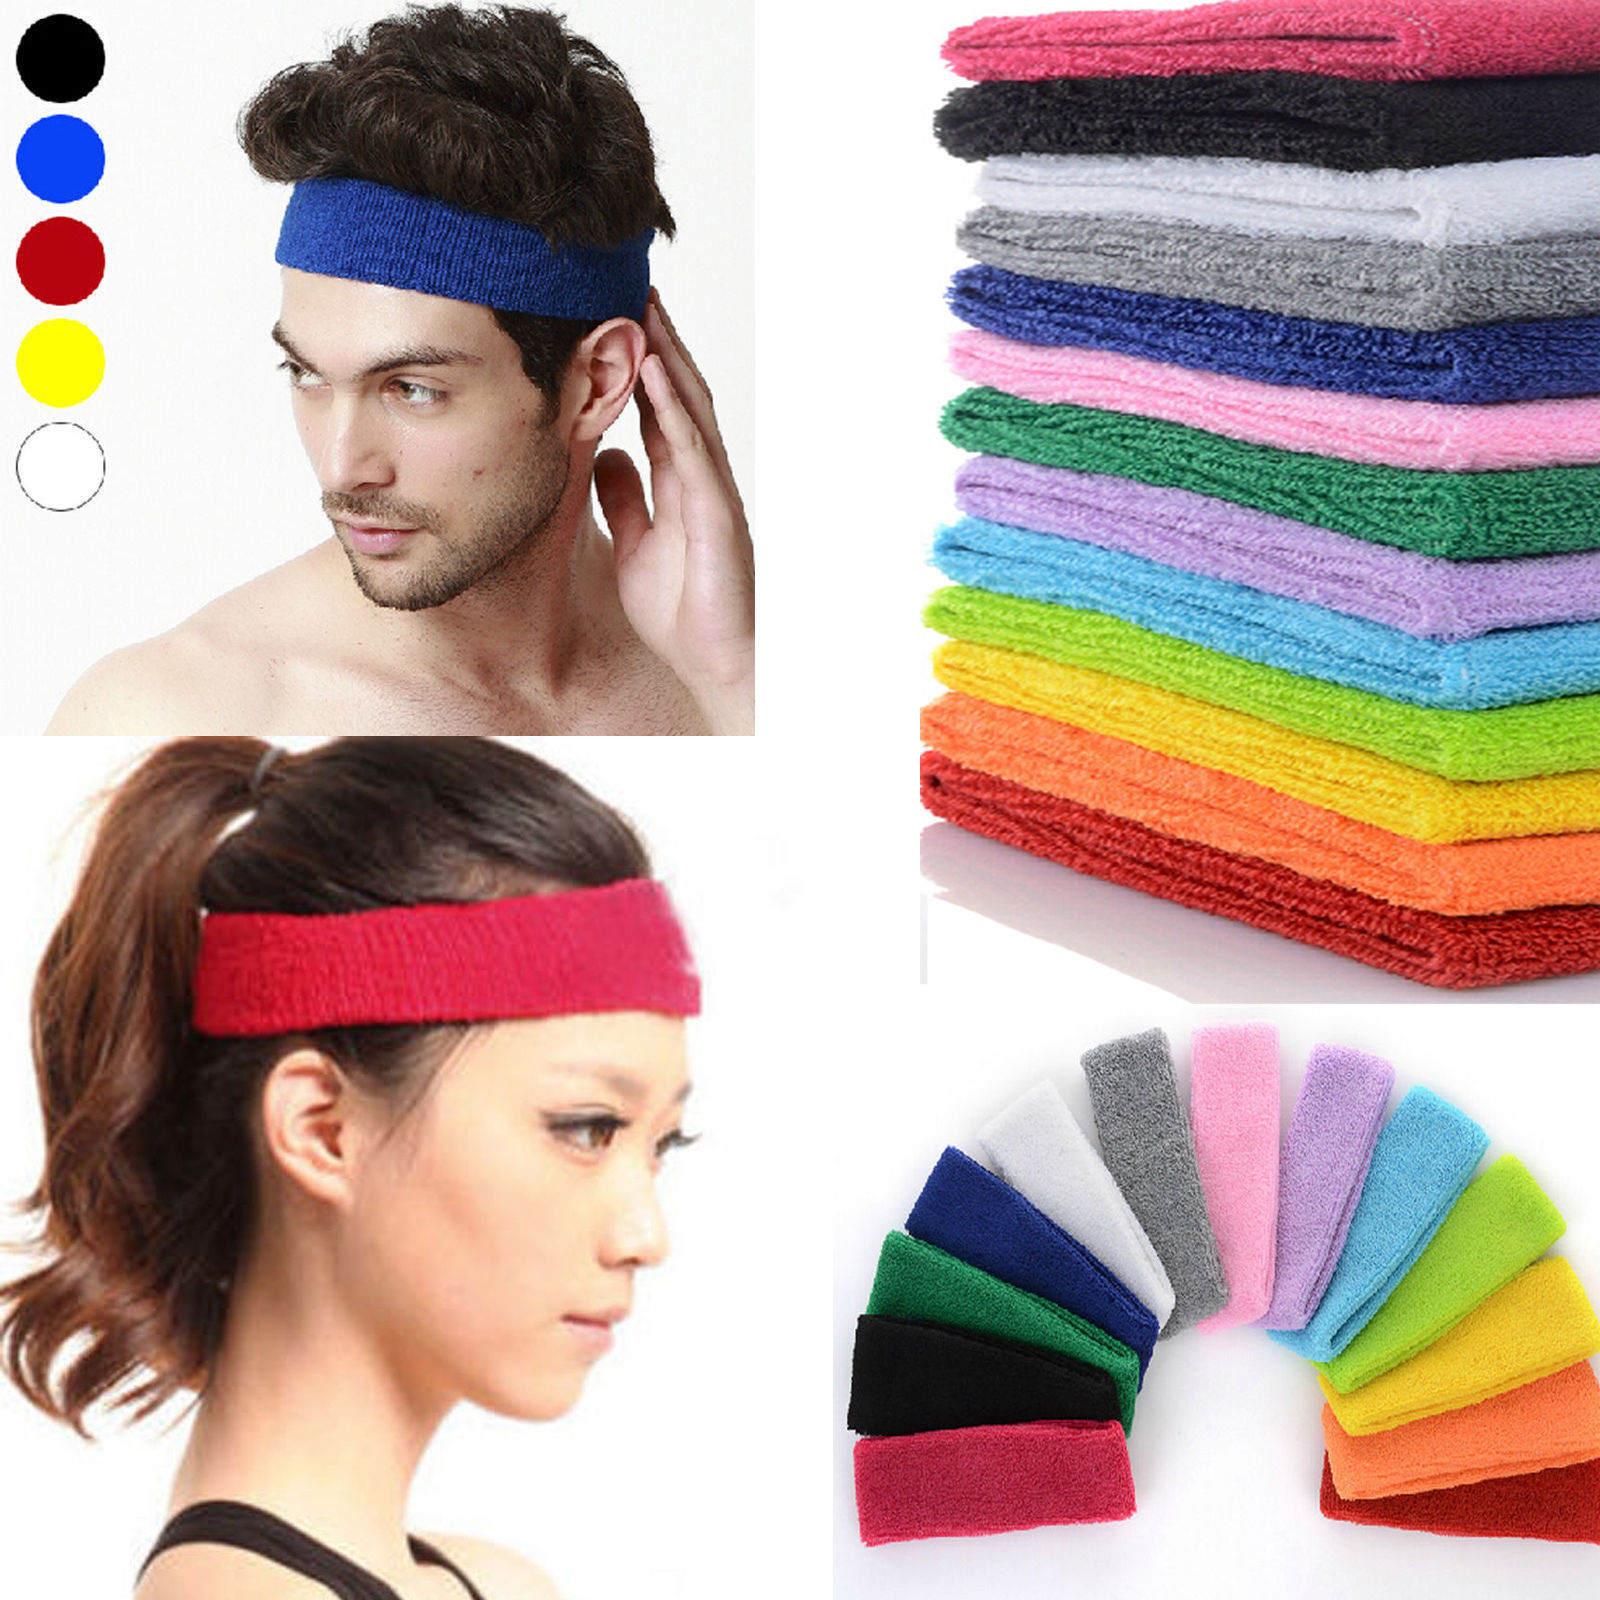 Headband for Men and Women Optical Two Multiple Spiral Balls Casual Headband Sweatband Fishing Mask Head Wrap Headwear Bandana Neck Gaiter